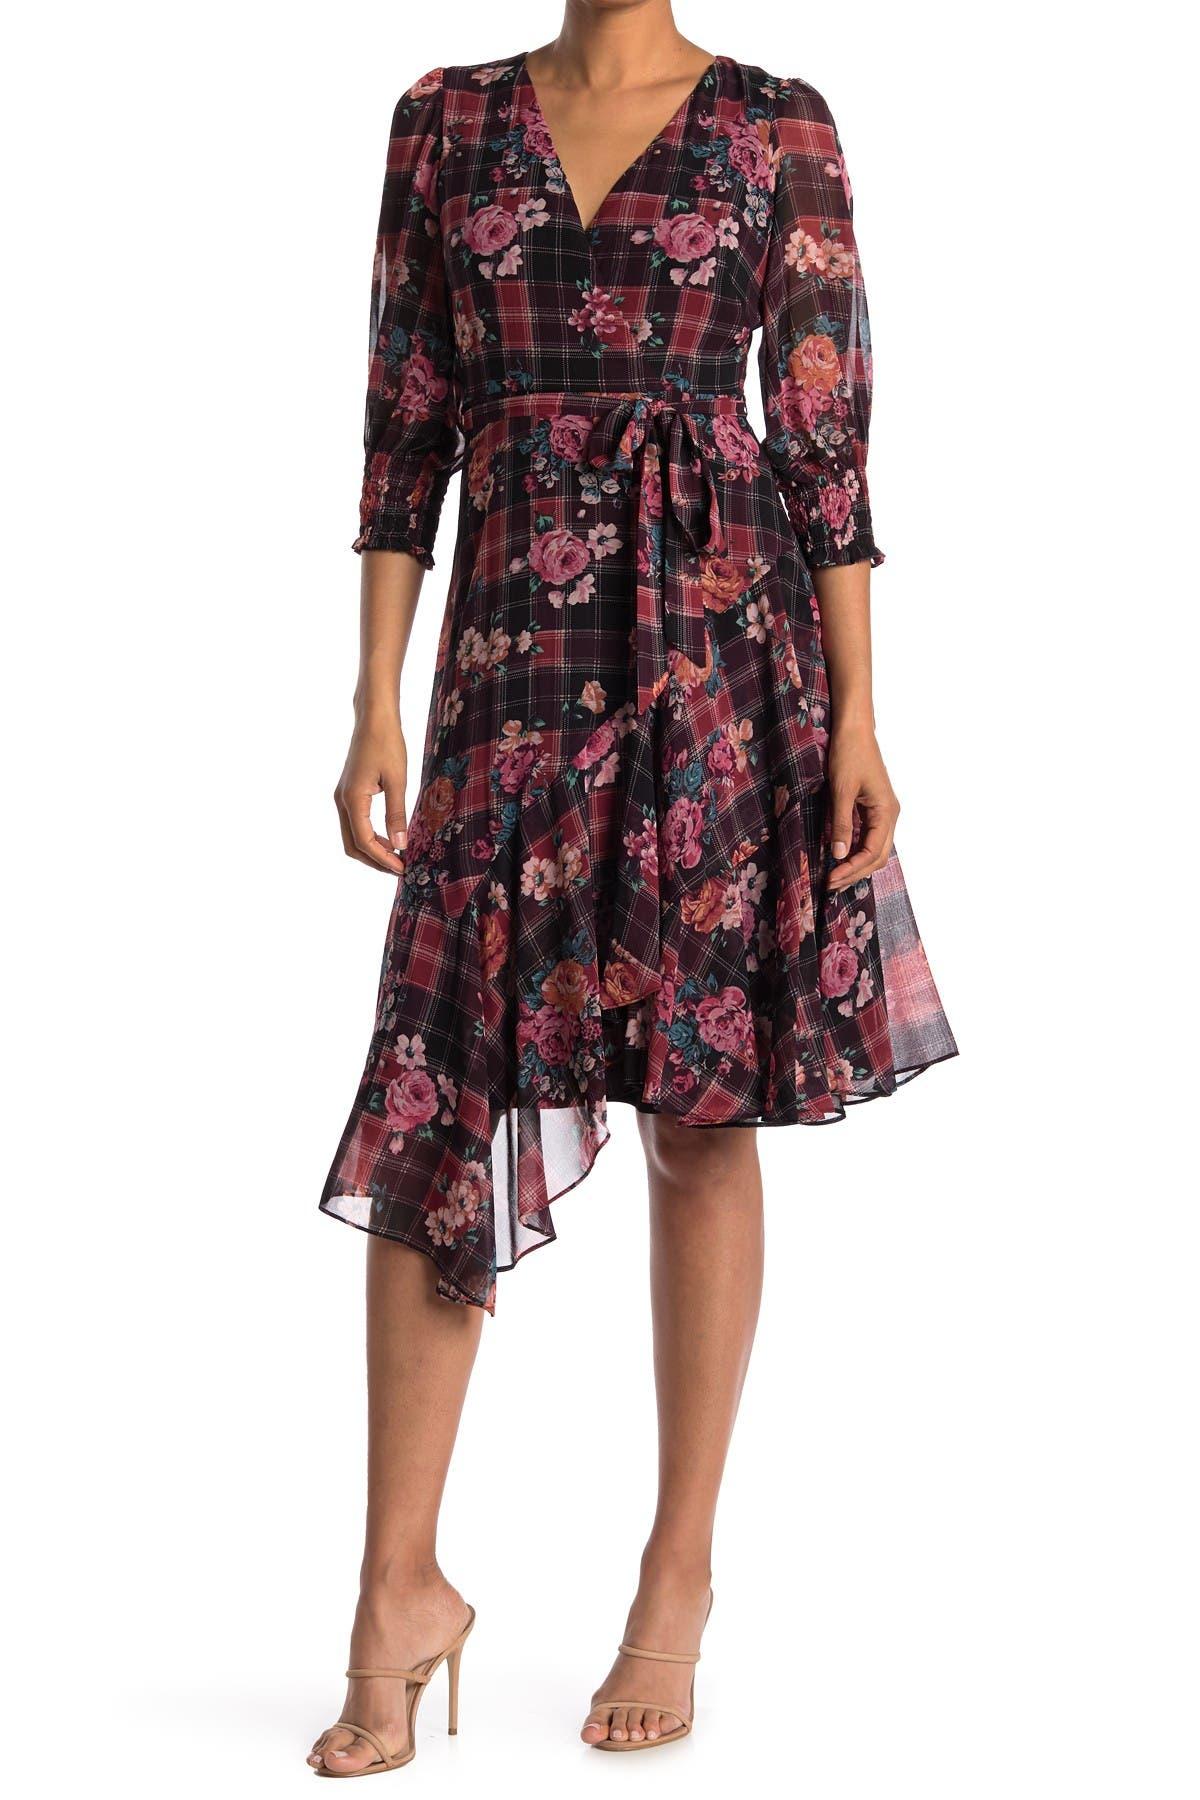 Image of Gabby Skye Elbow Sleeve Floral Plaid Dress